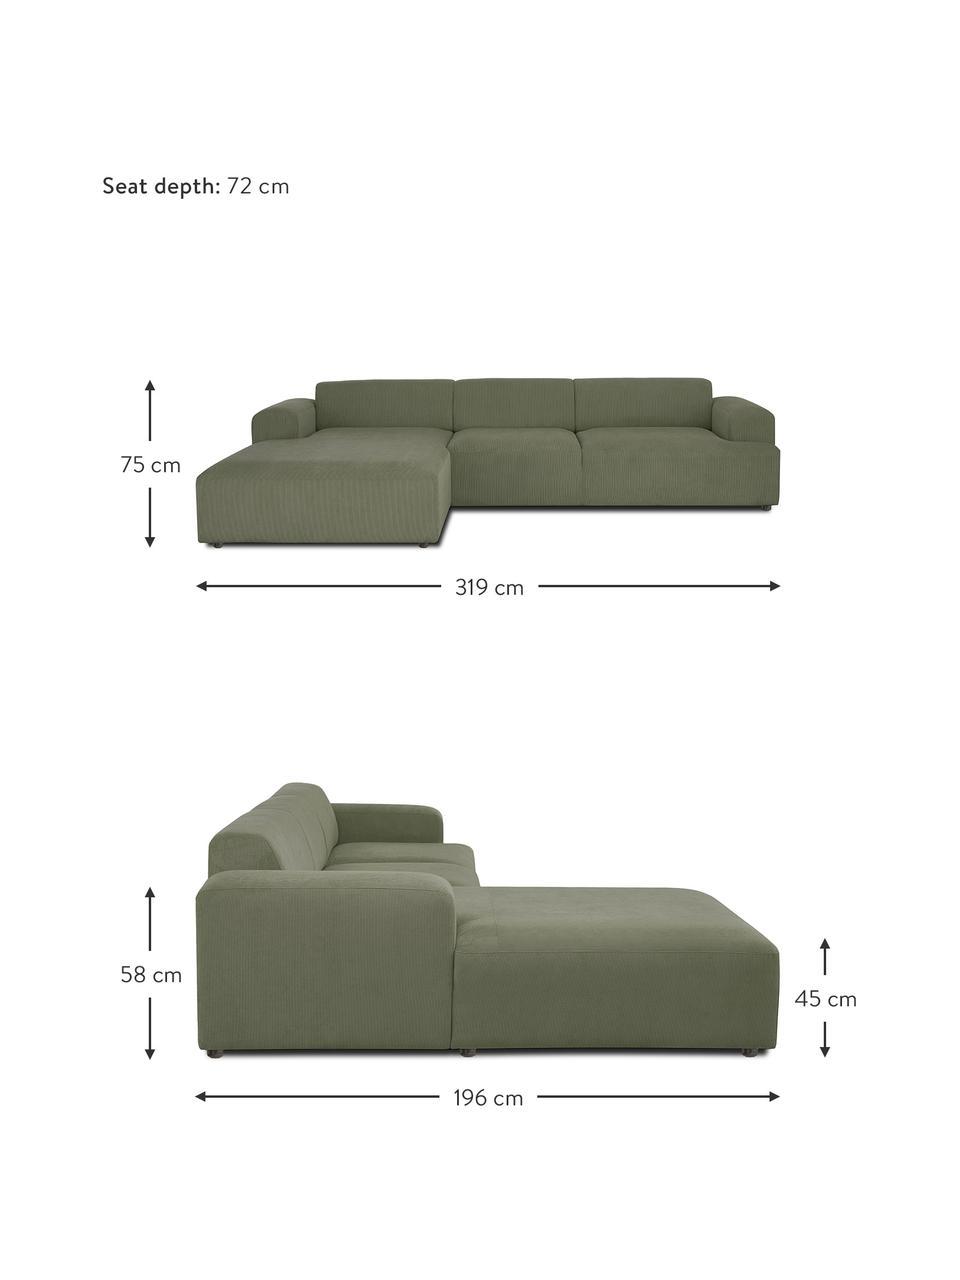 Cord-Ecksofa Melva (4-Sitzer) in Grün, Bezug: Cord (92% Polyester, 8% P, Gestell: Massives Kiefernholz, FSC, Füße: Kunststoff, Cord Grün, B 319 x T 196 cm